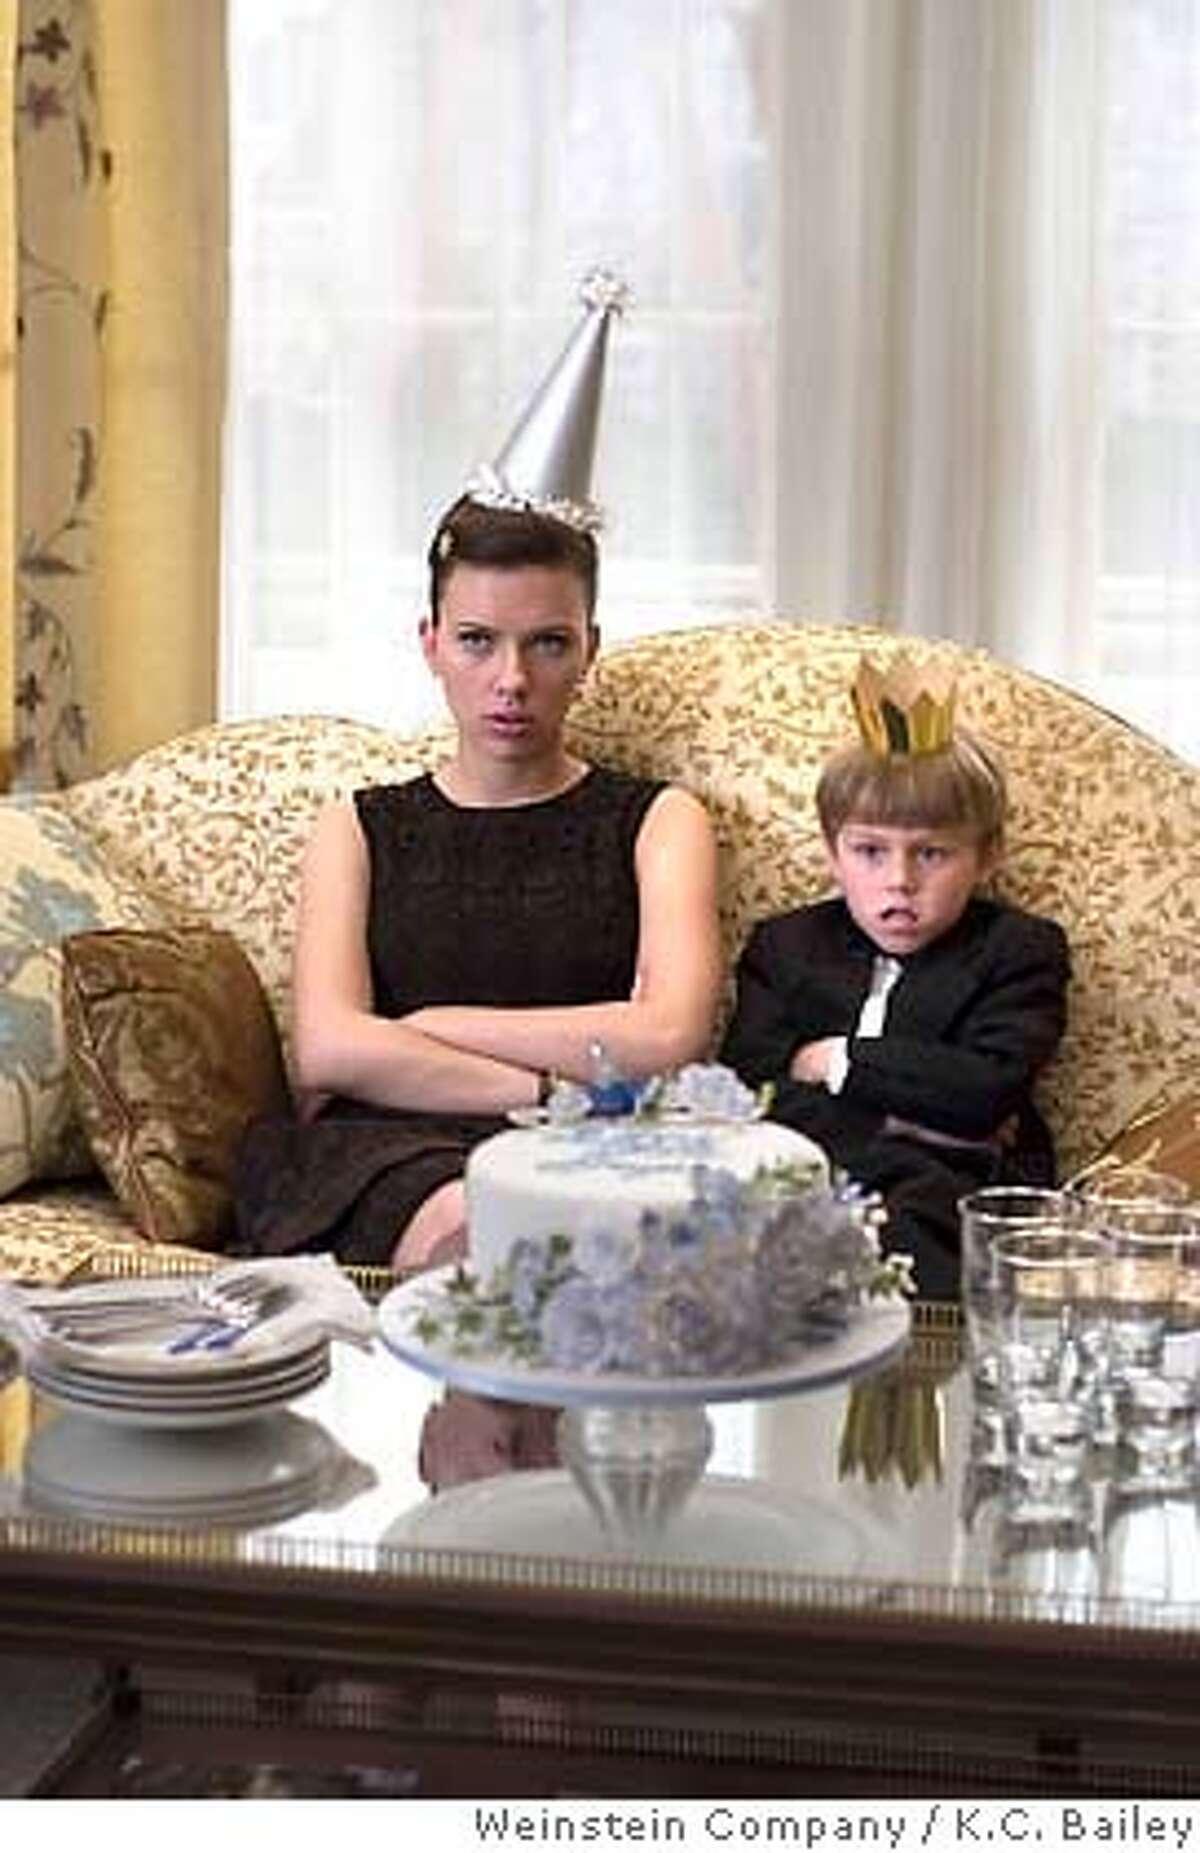 Scarlett Johansson (Annie Braddock) and Nicholas Reese Art (Grayer) star in Shari Springer Berman and Robert Pulcini's The Nanny Diaries.